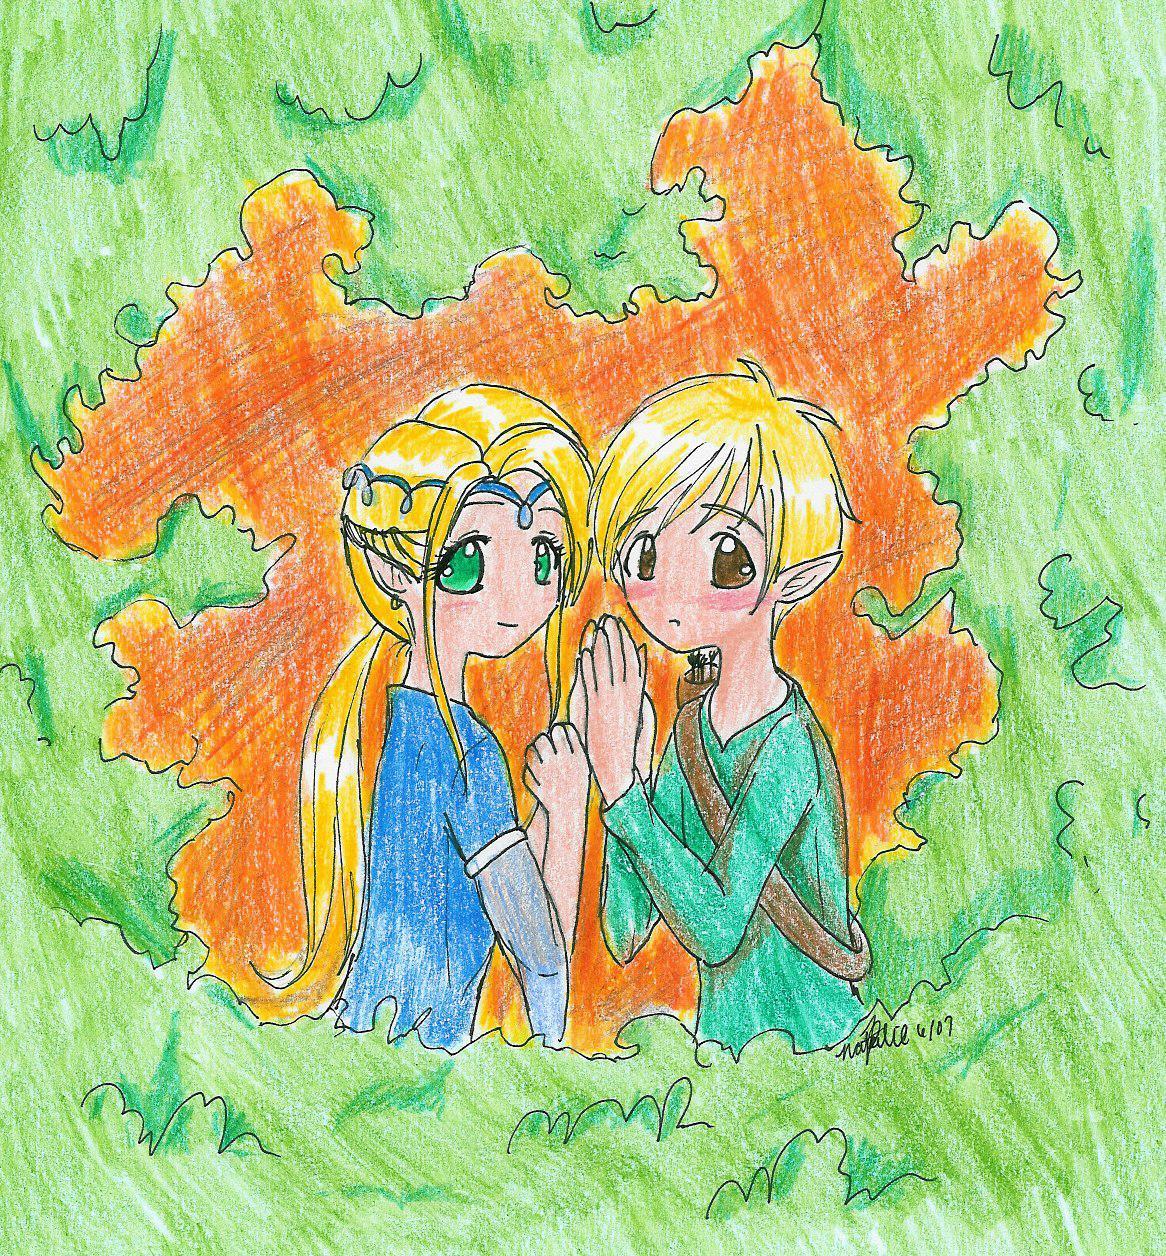 Elves (for jiggypiggy's contest) by Fumie716